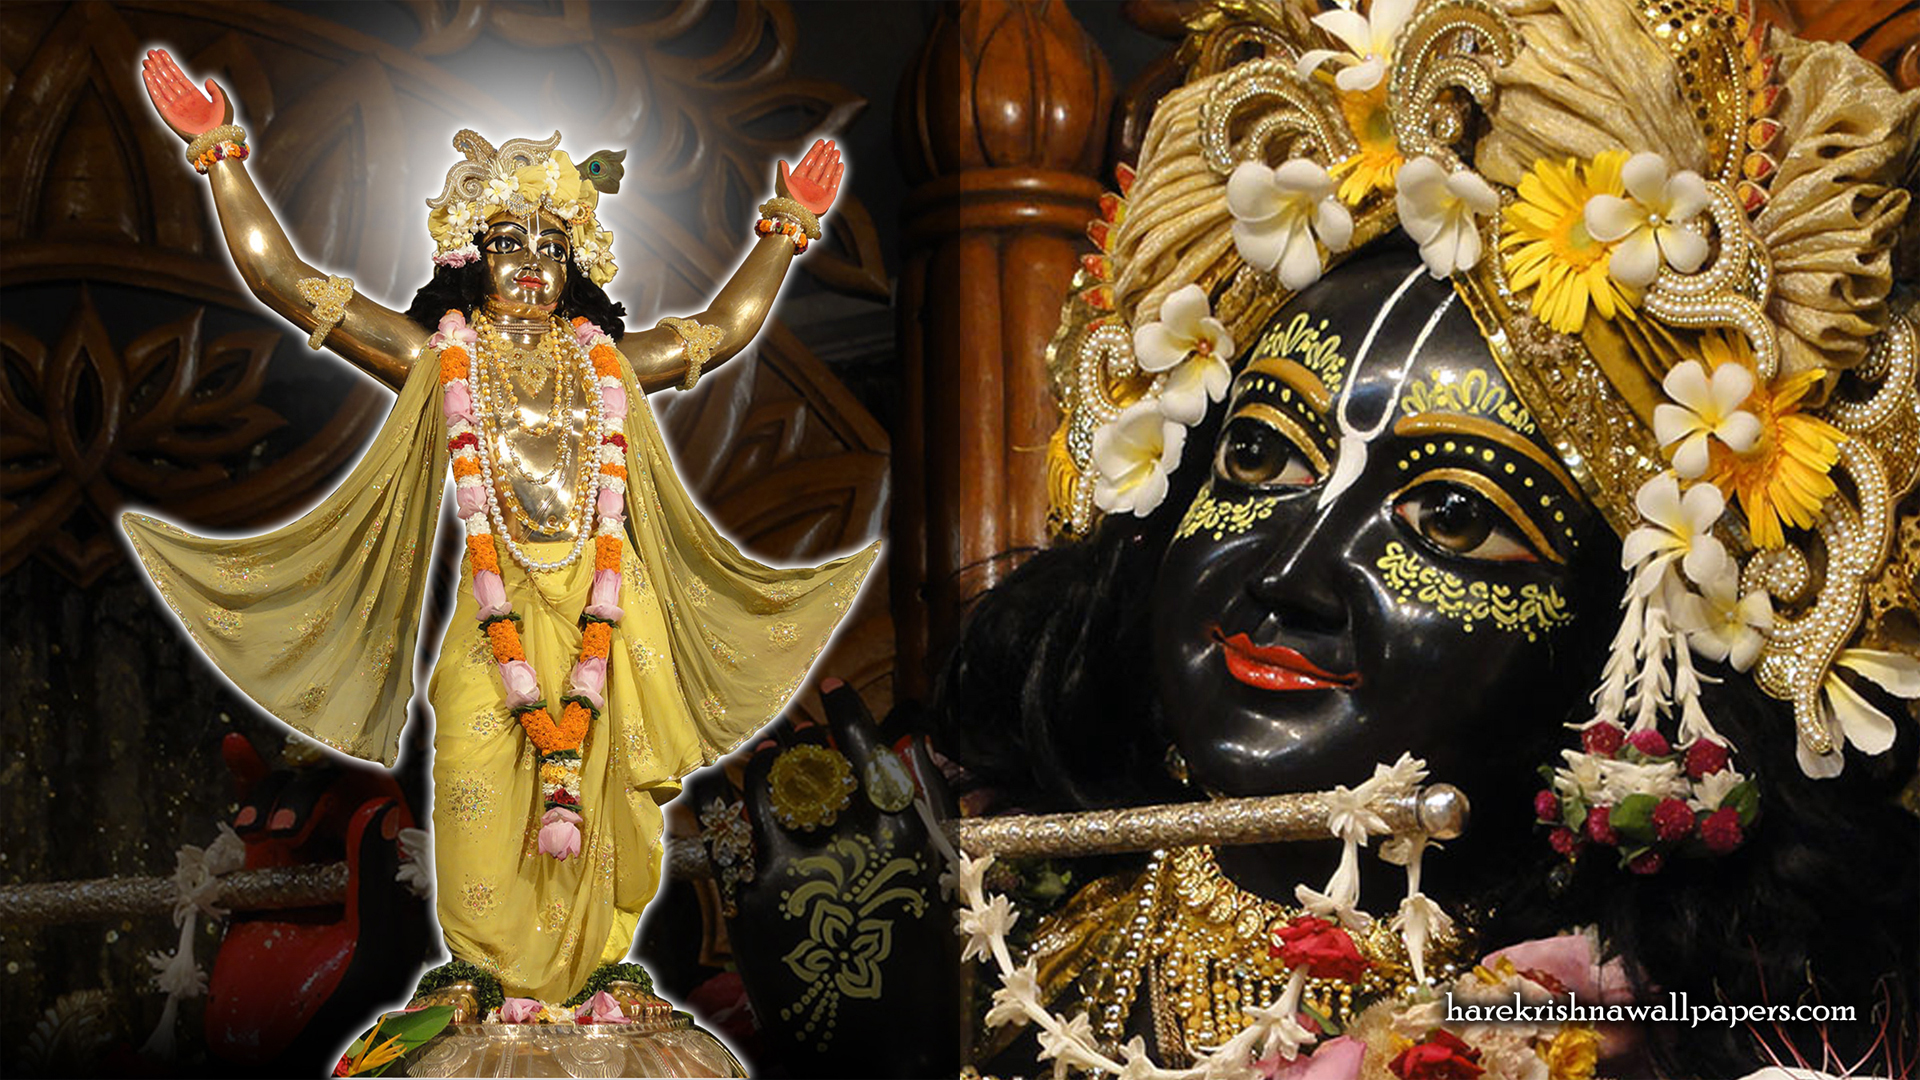 Chaitanya Mahaprabhu Wallpaper (003) Size 1920x1080 Download